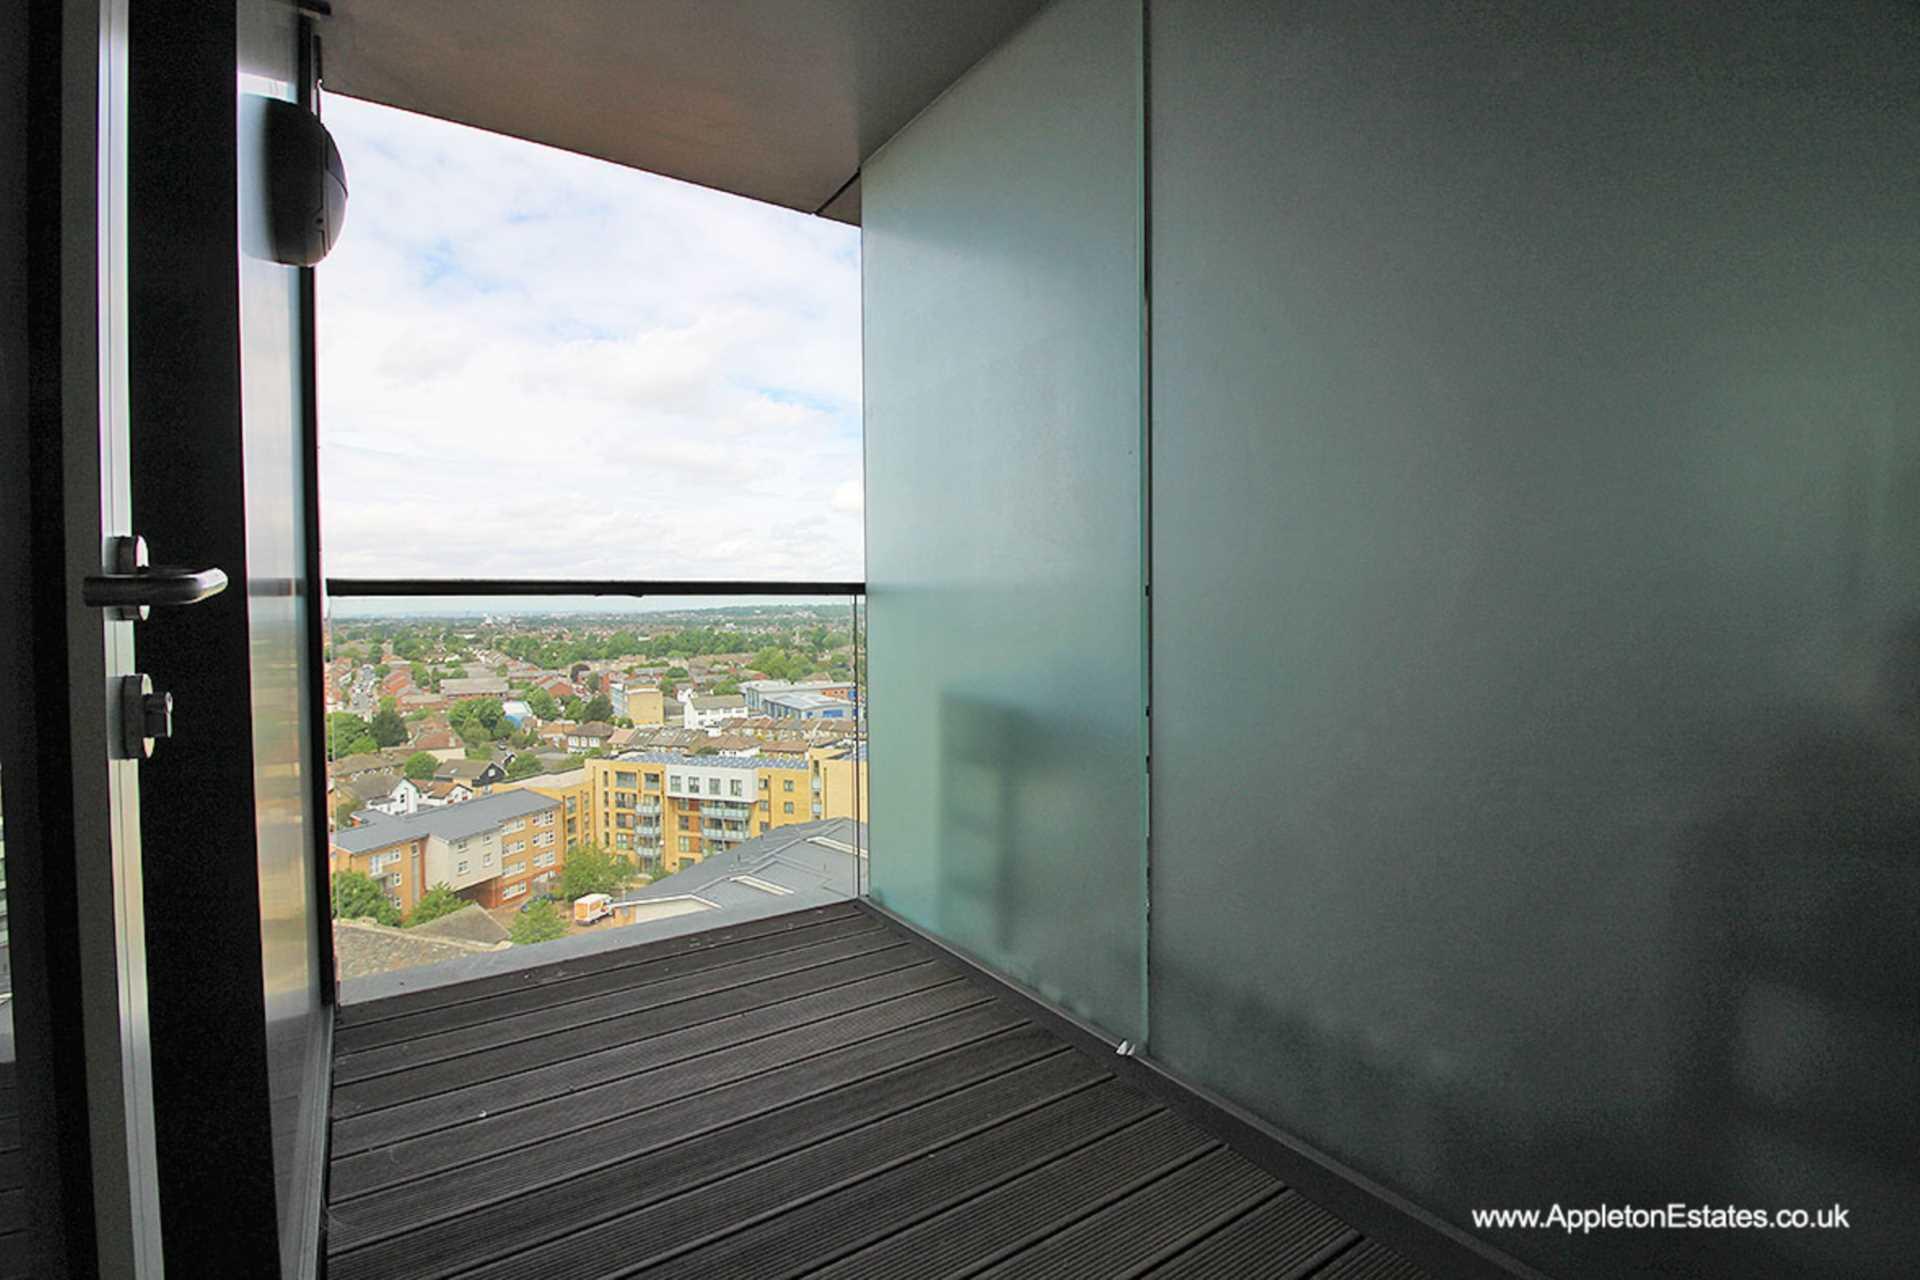 2 bedroom apartment for sale the island newgate croydon for 18th floor balcony mp3